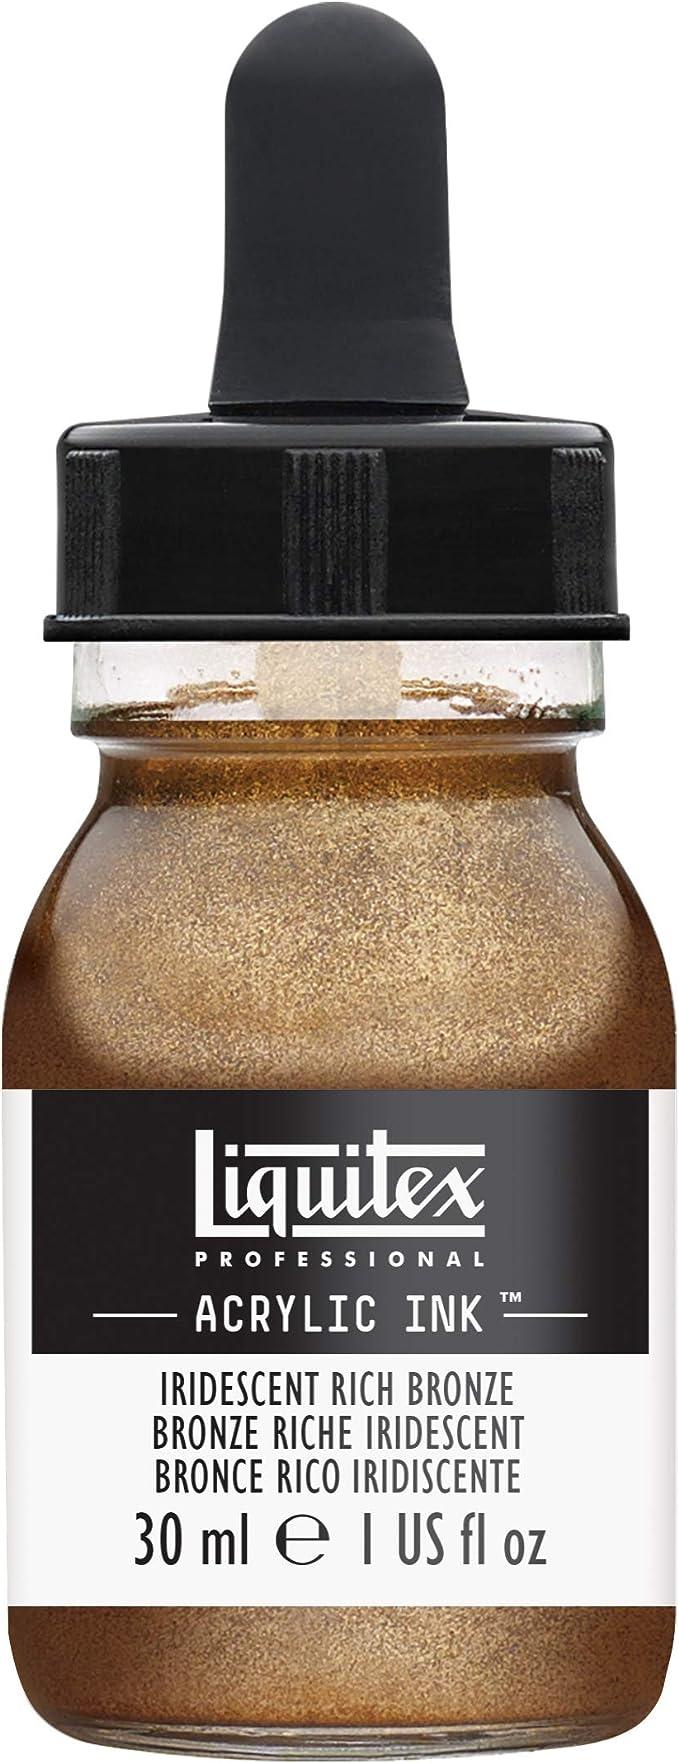 Liquitex Tinta acrílica Ink Profesional Frasco 30 ml, Bronce Rico Iridiscente